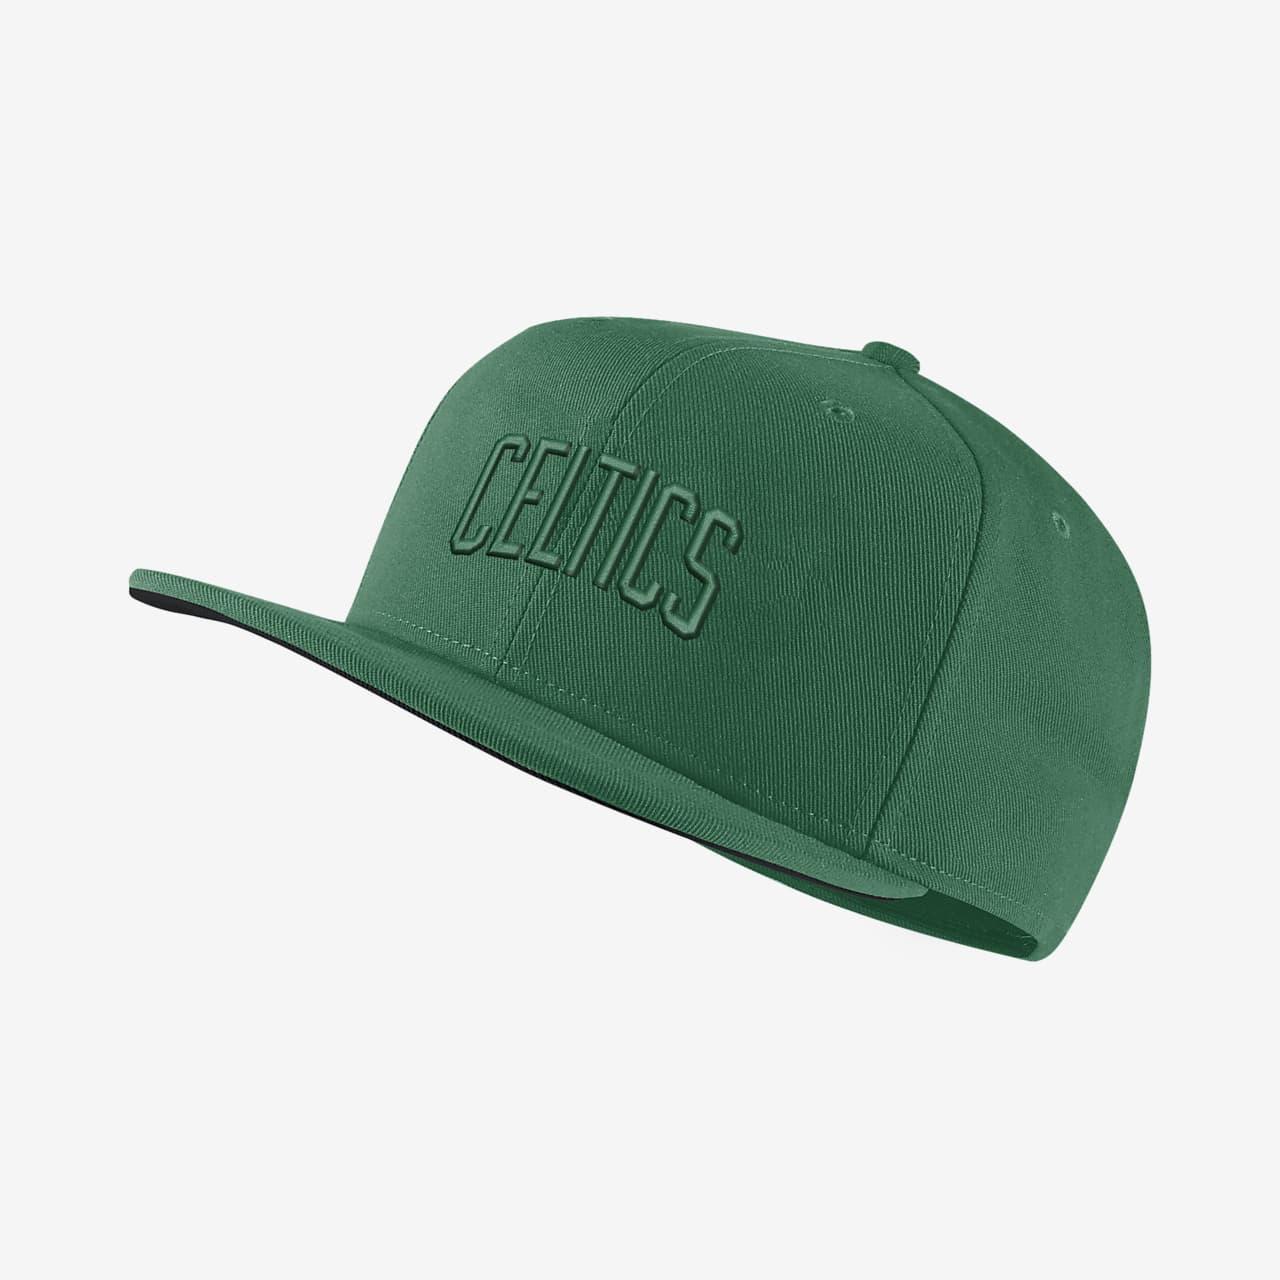 NBA-keps Boston Celtics Nike AeroBill